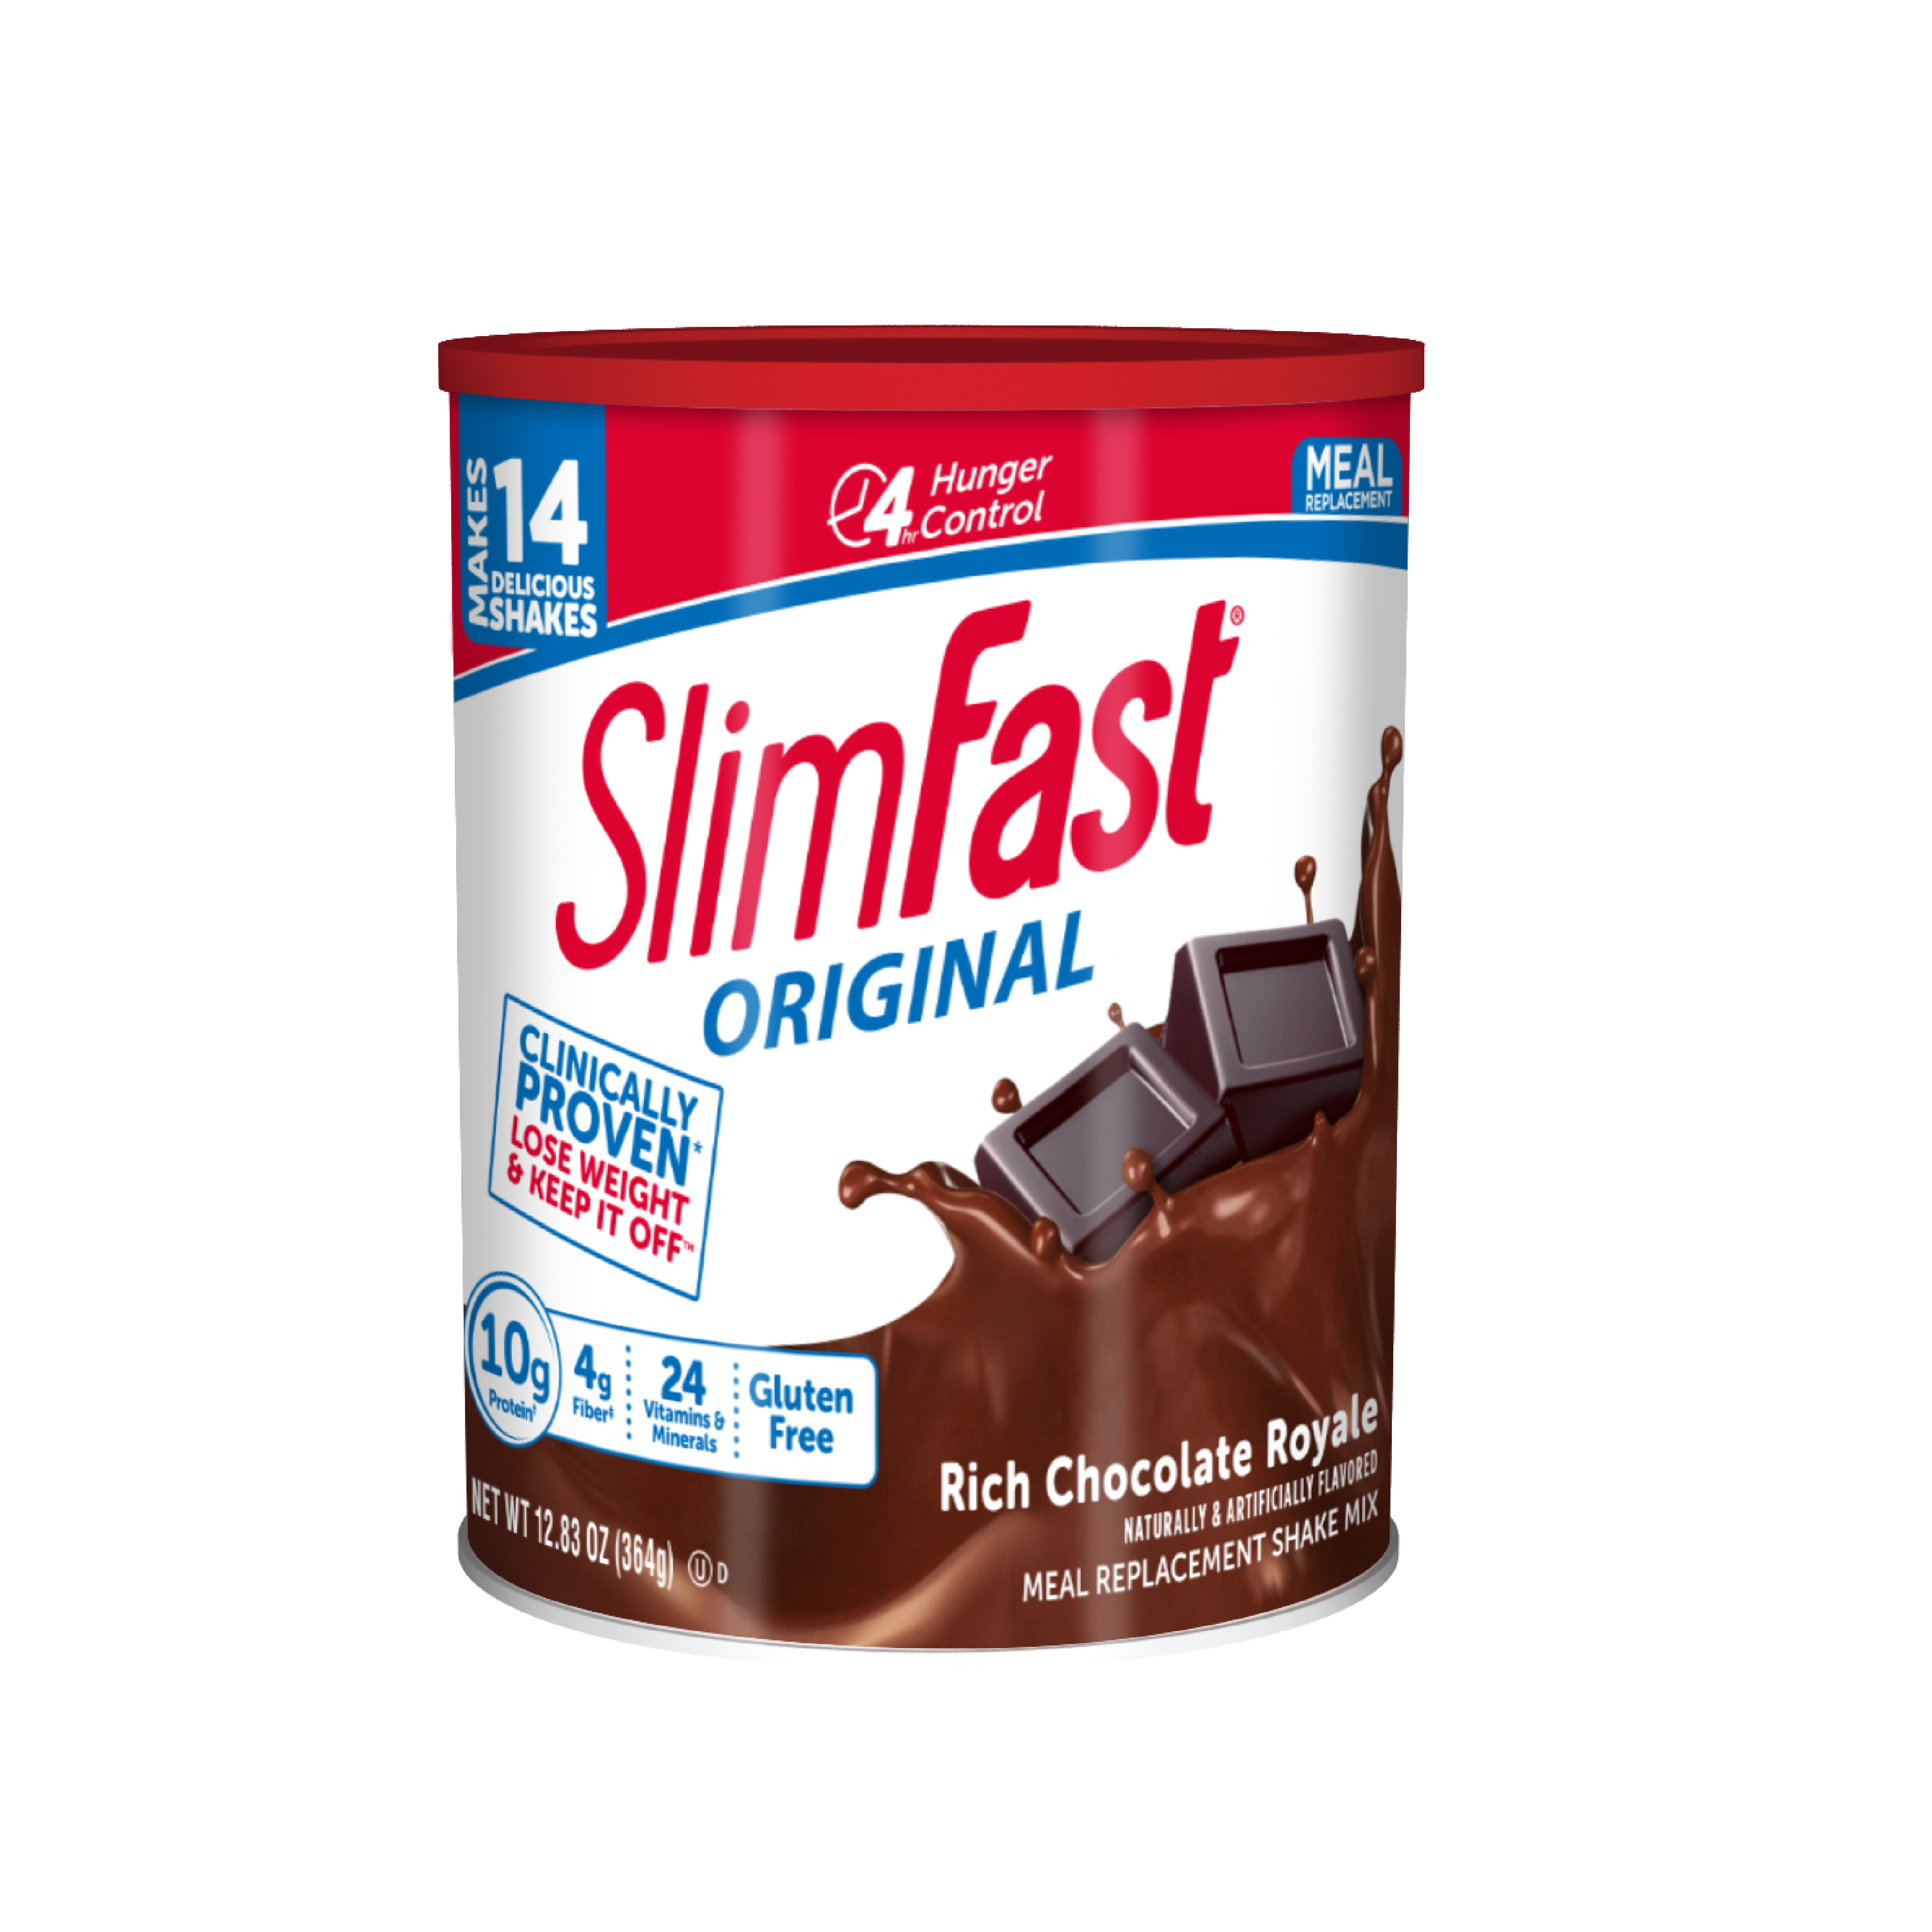 SlimFast Original Meal Replacement Shake Mix Powder Rich Chocolate Royale 12 83oz 14 servings Walmart